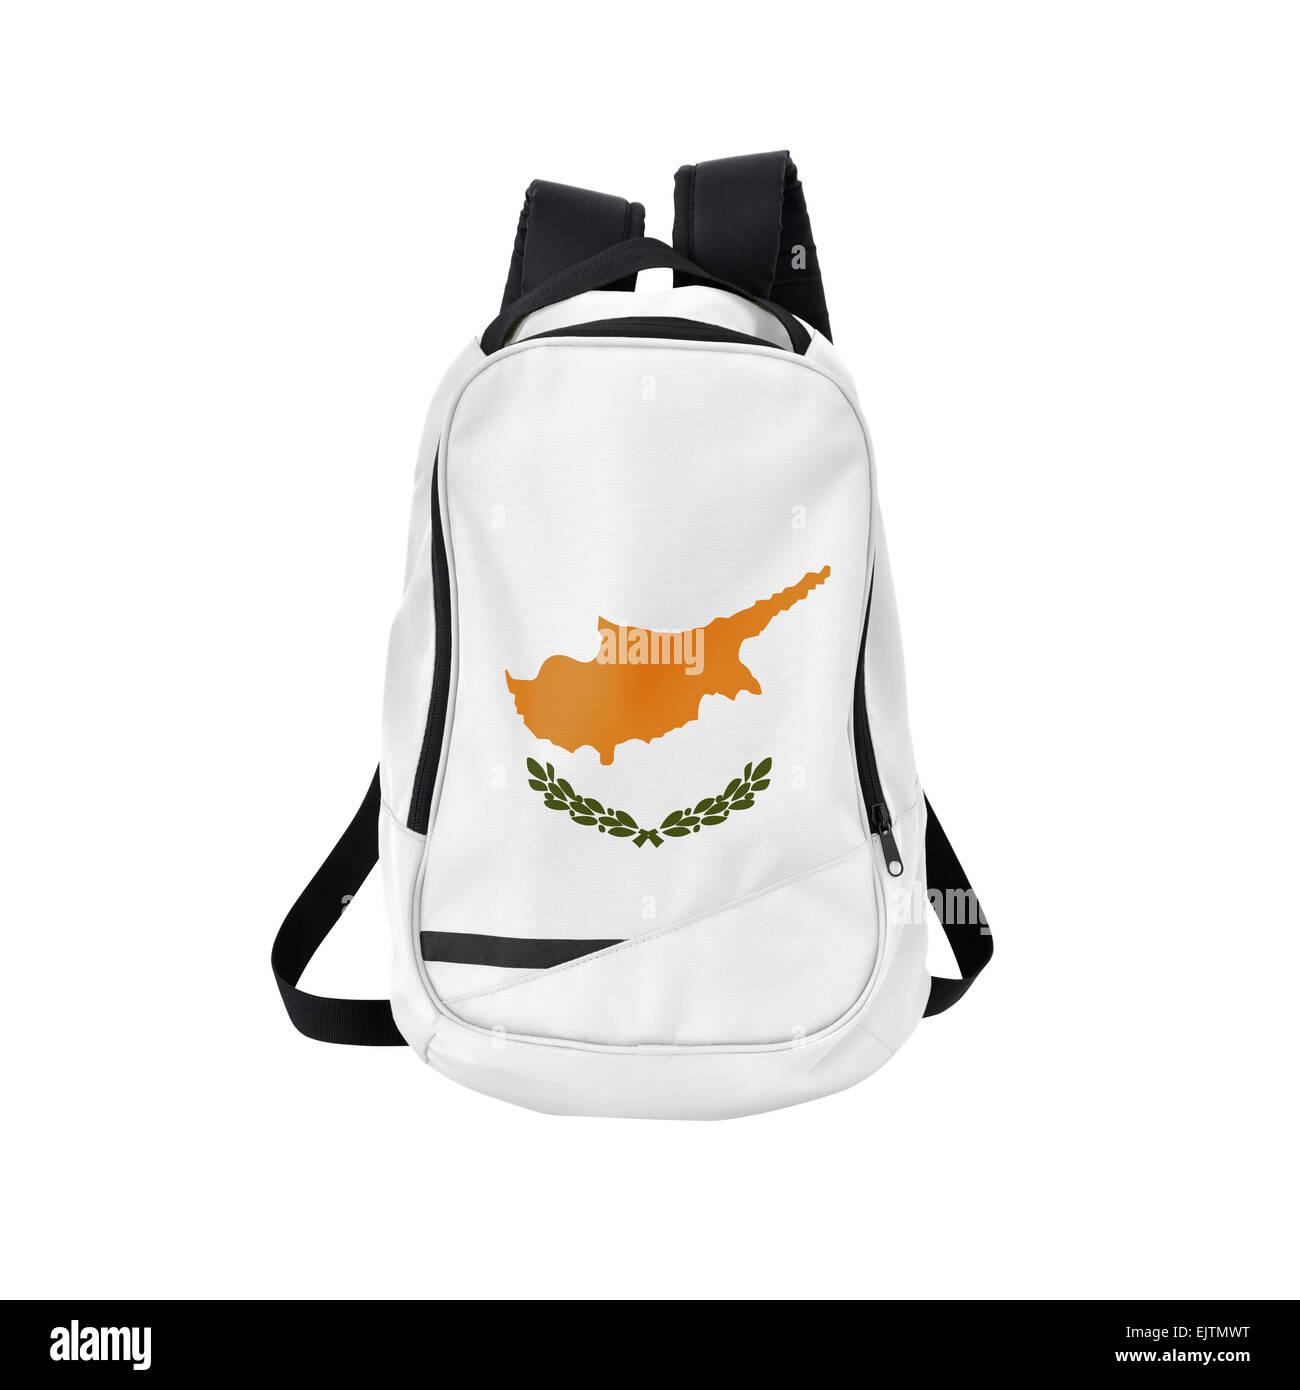 cyprus flag isolated Stock Photos & cyprus flag isolated Stock ...